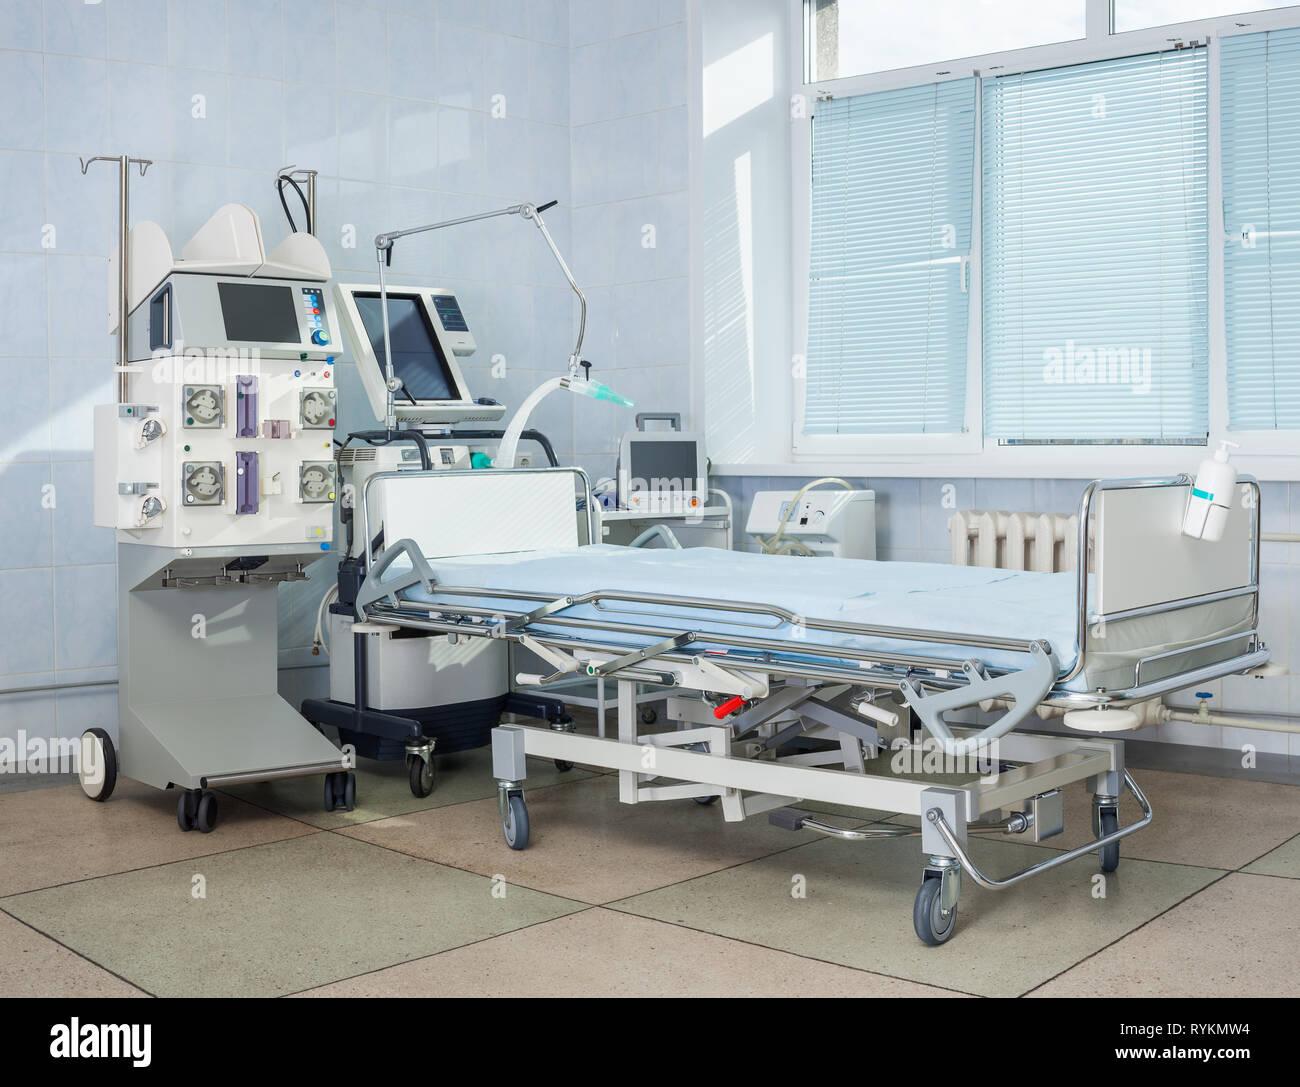 ICU hospital bed - Stock Image